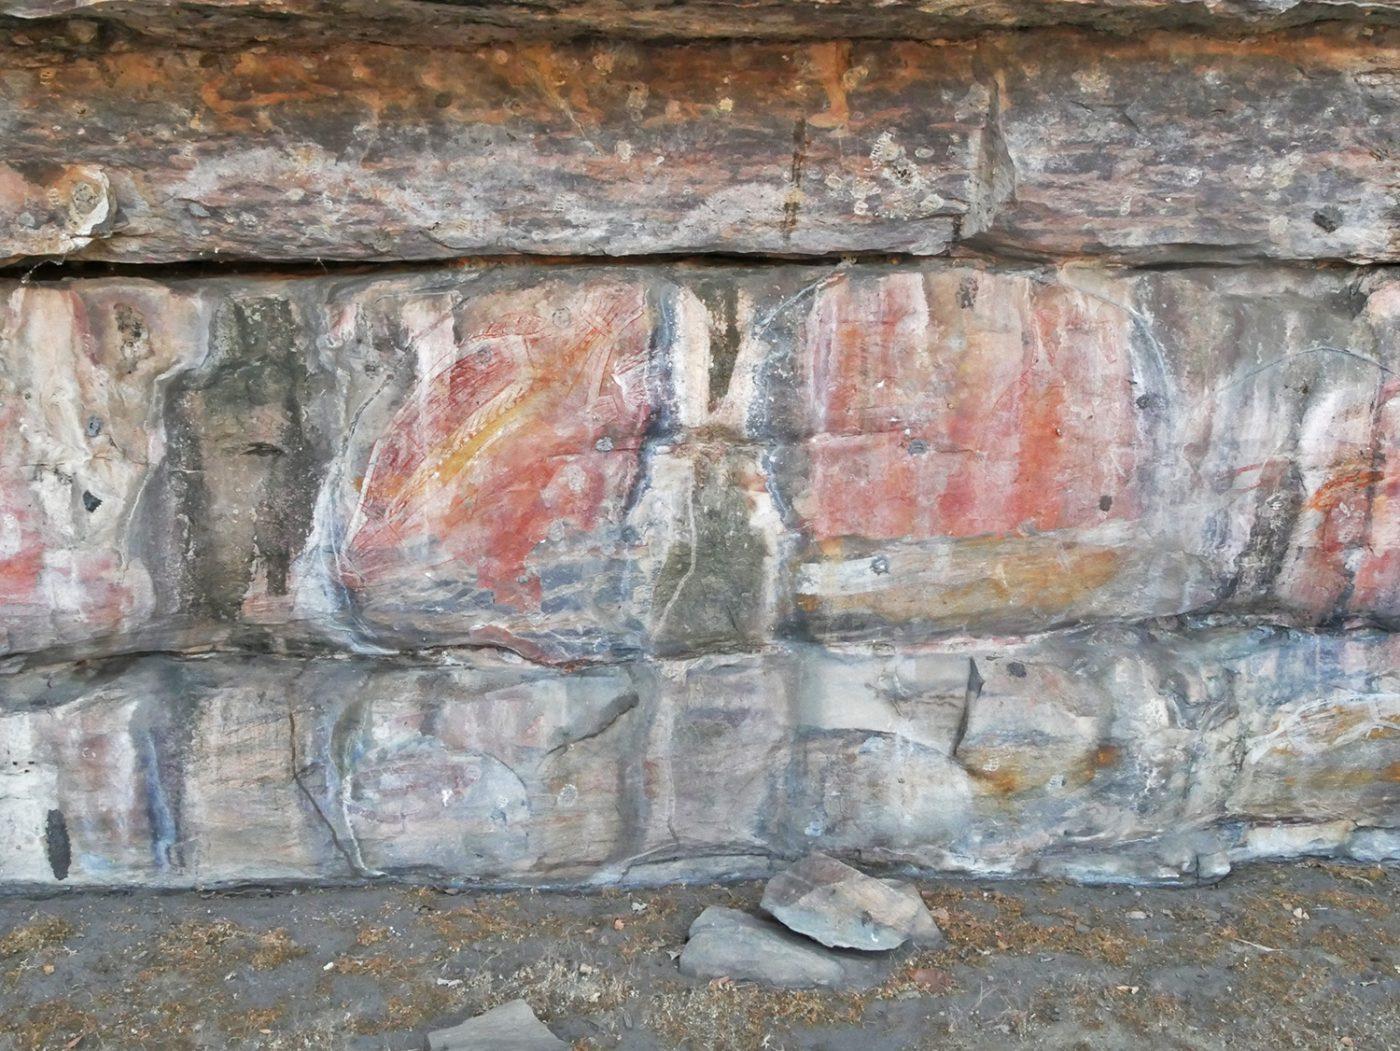 Rock art at Ubirr Rock